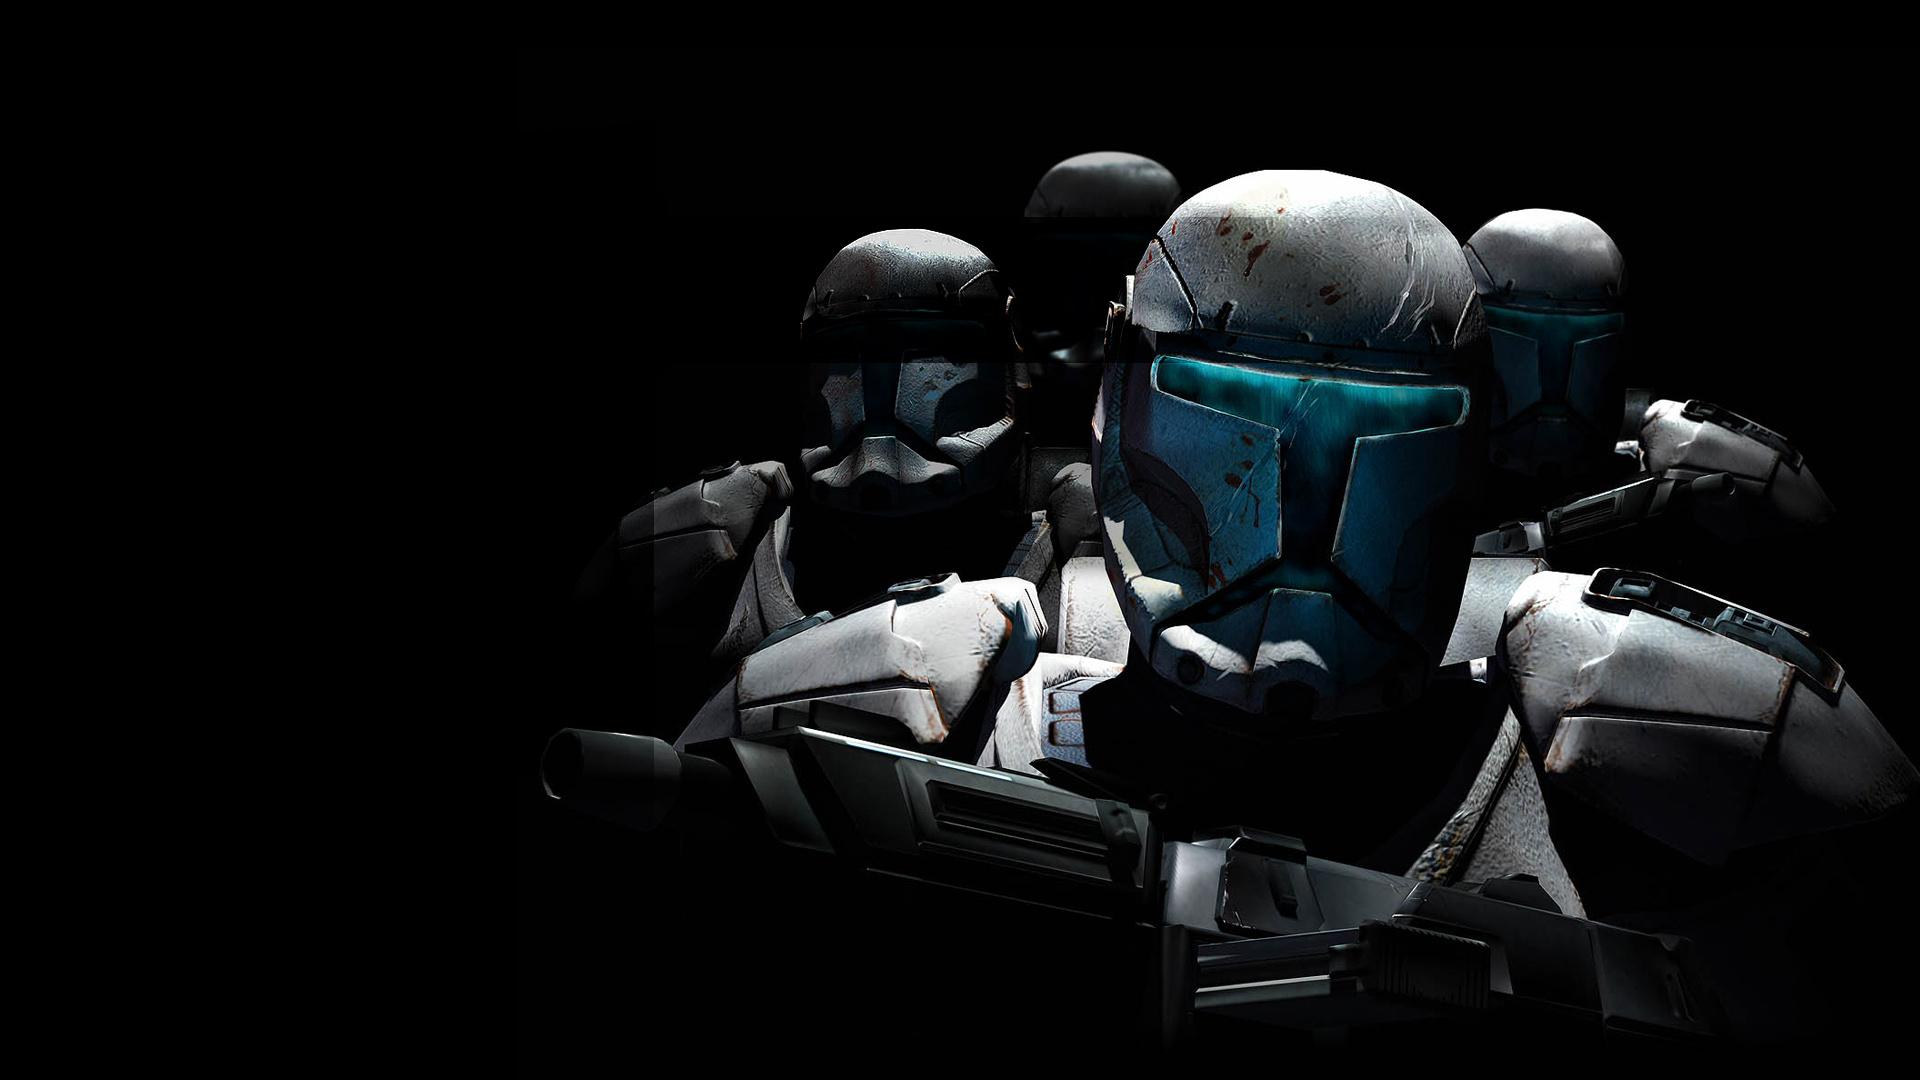 Clone Commando squad image   501st Legion Vaders Fist   Mod DB 1920x1080